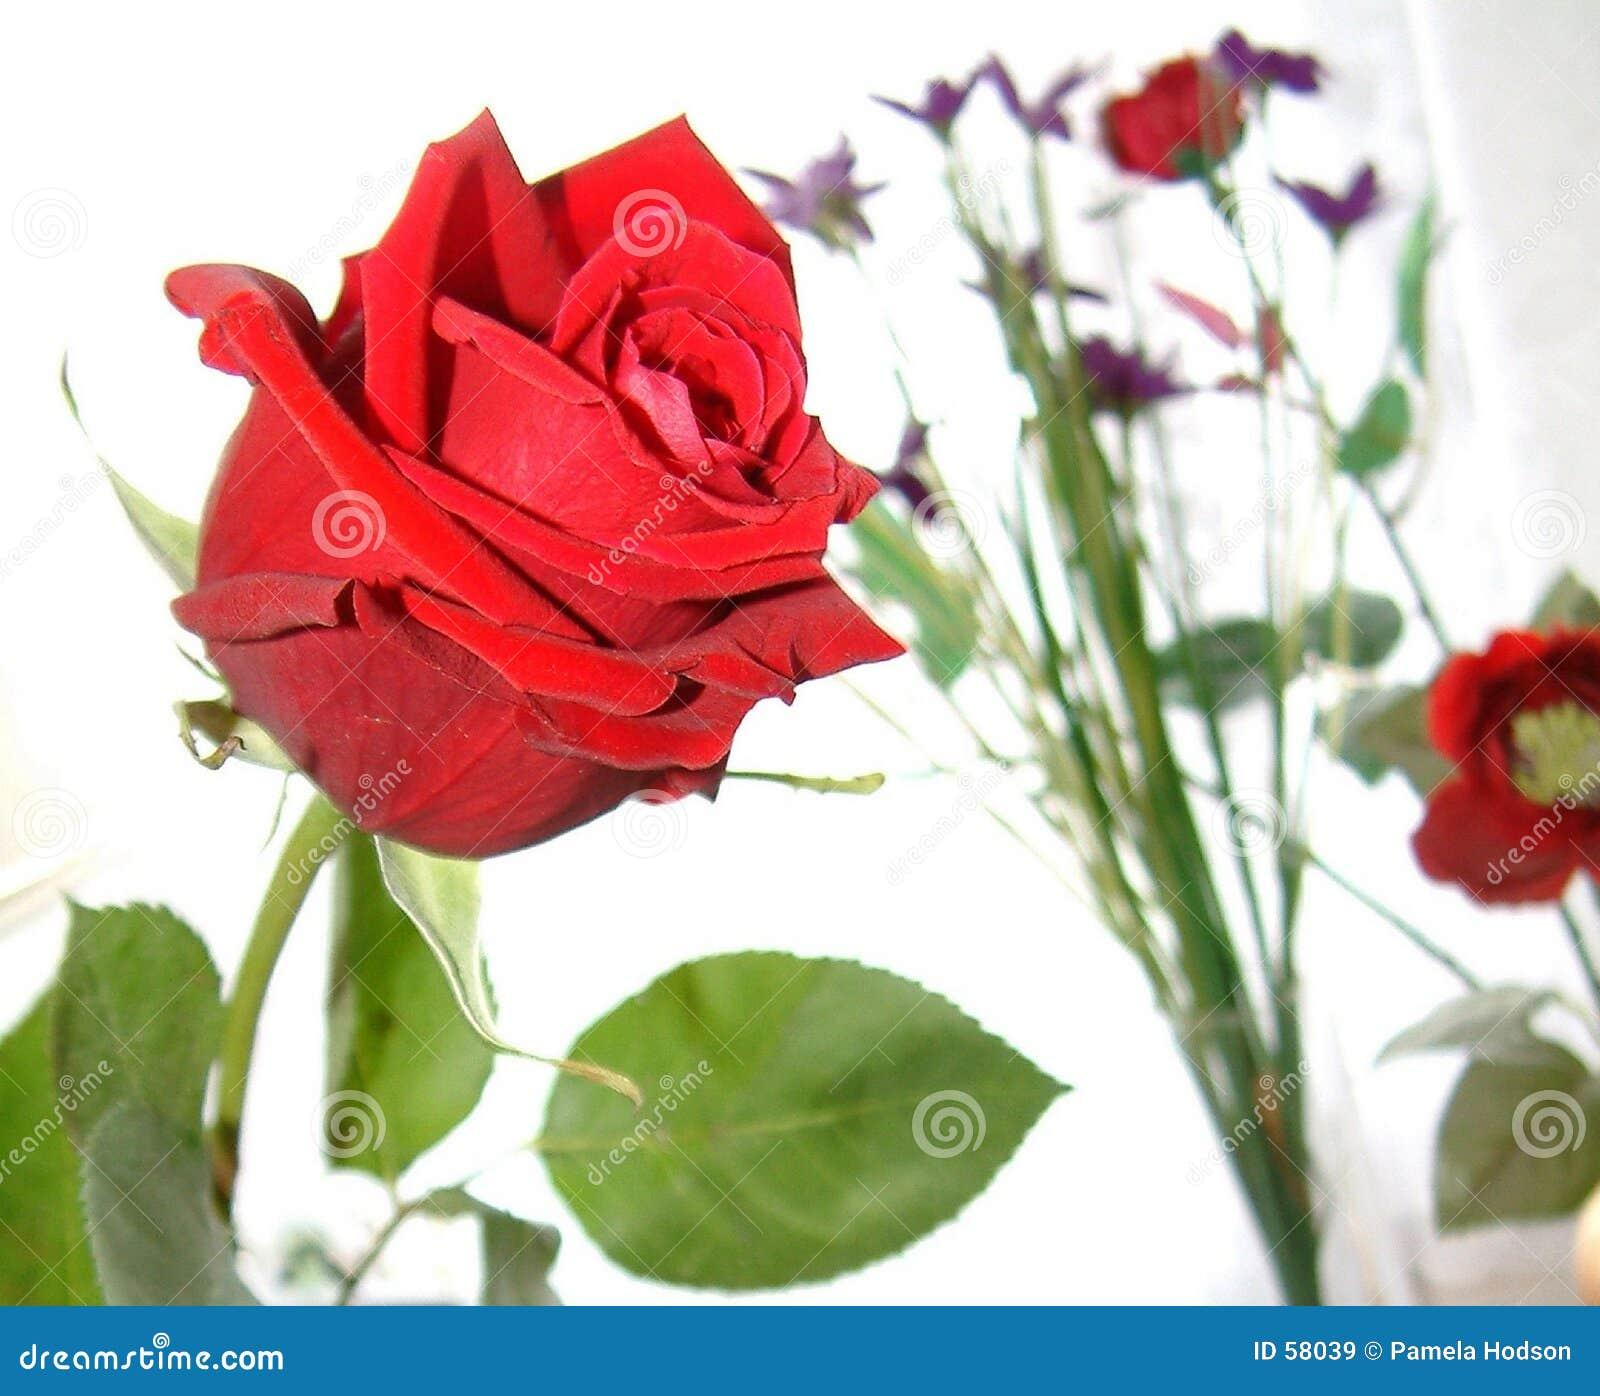 Download Rose de l'amour image stock. Image du rouge, rose, abstrait - 58039